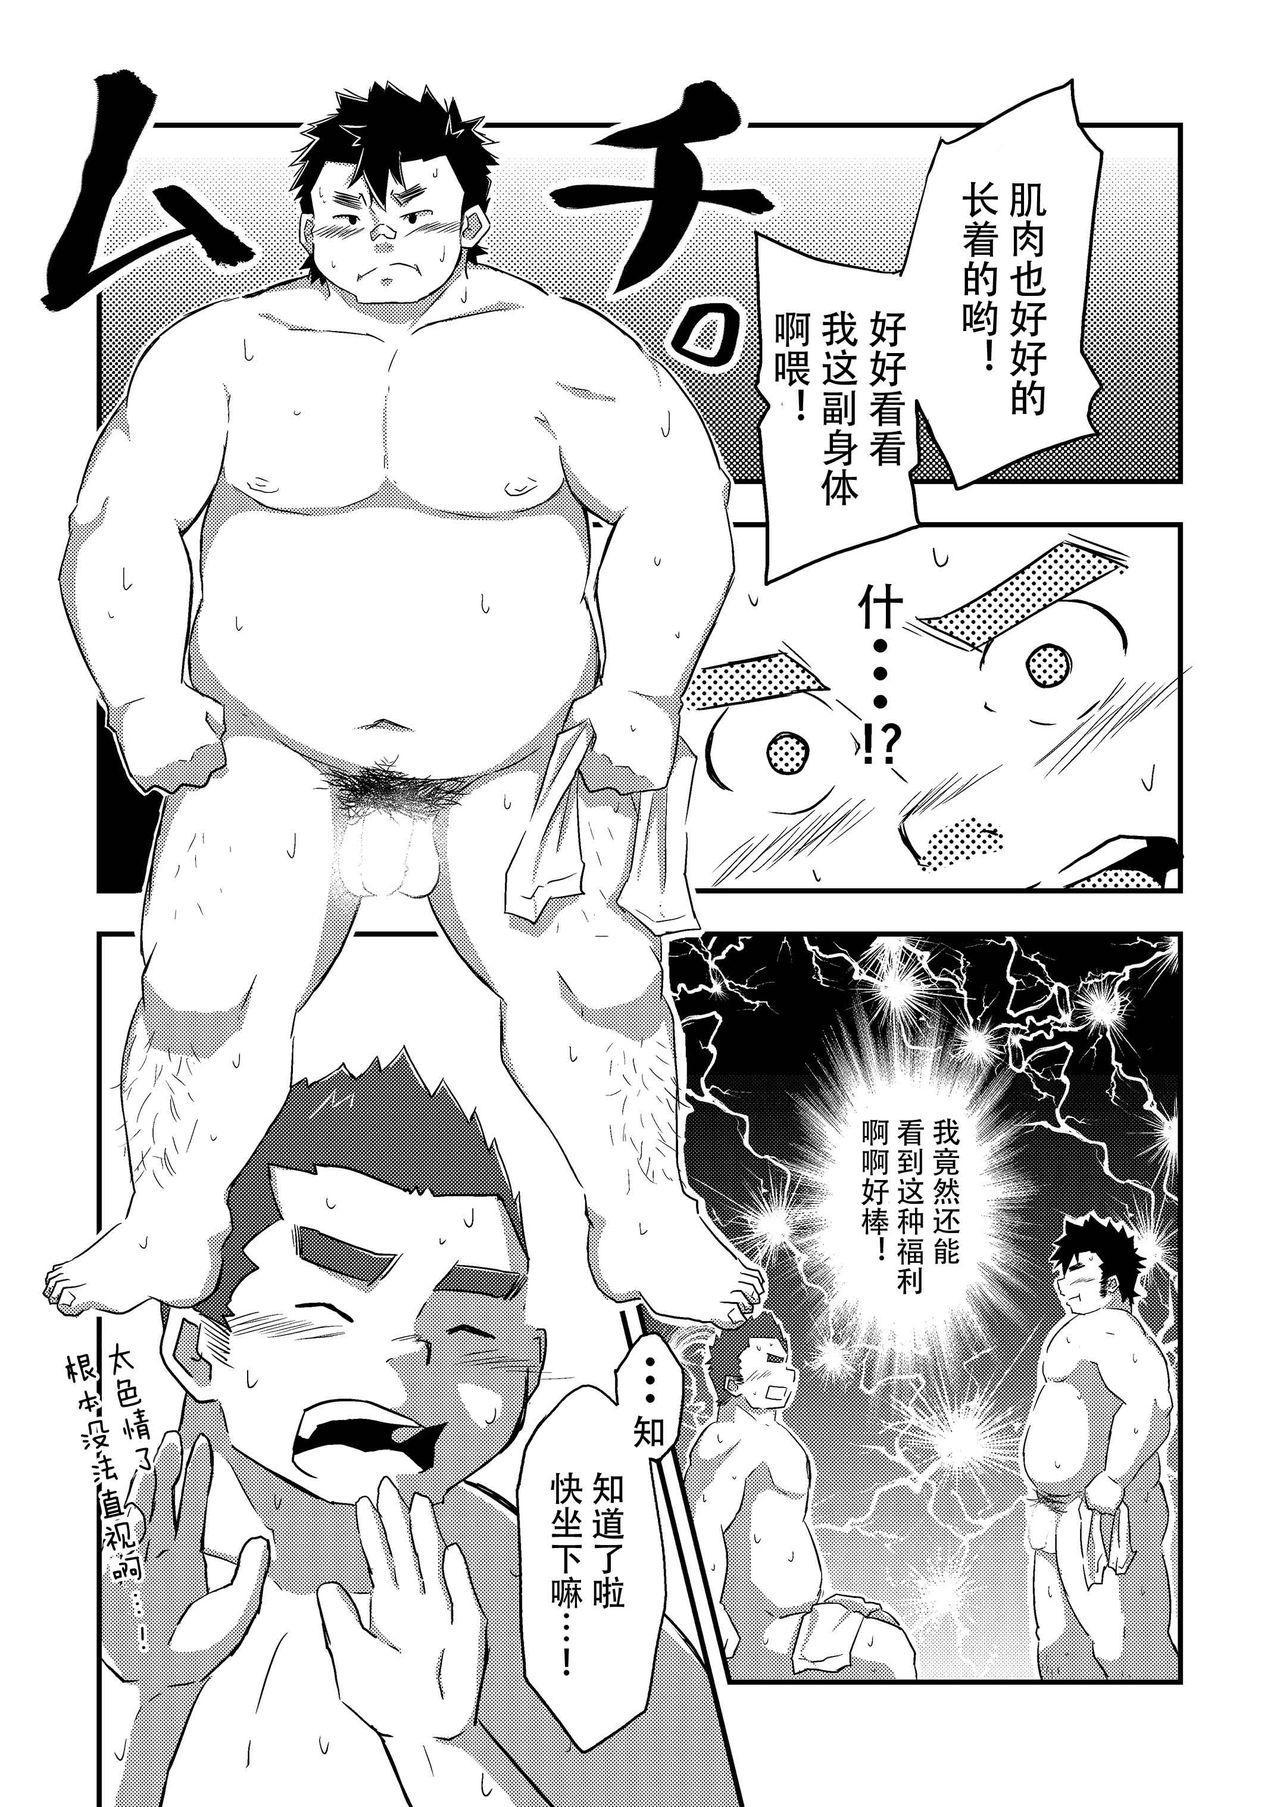 [CorkBOX (ngng)] Ise-kun wa Tamatte Iru. - Ise-kun is horny. [Chinese] {日曜日汉化} [Digital] 10